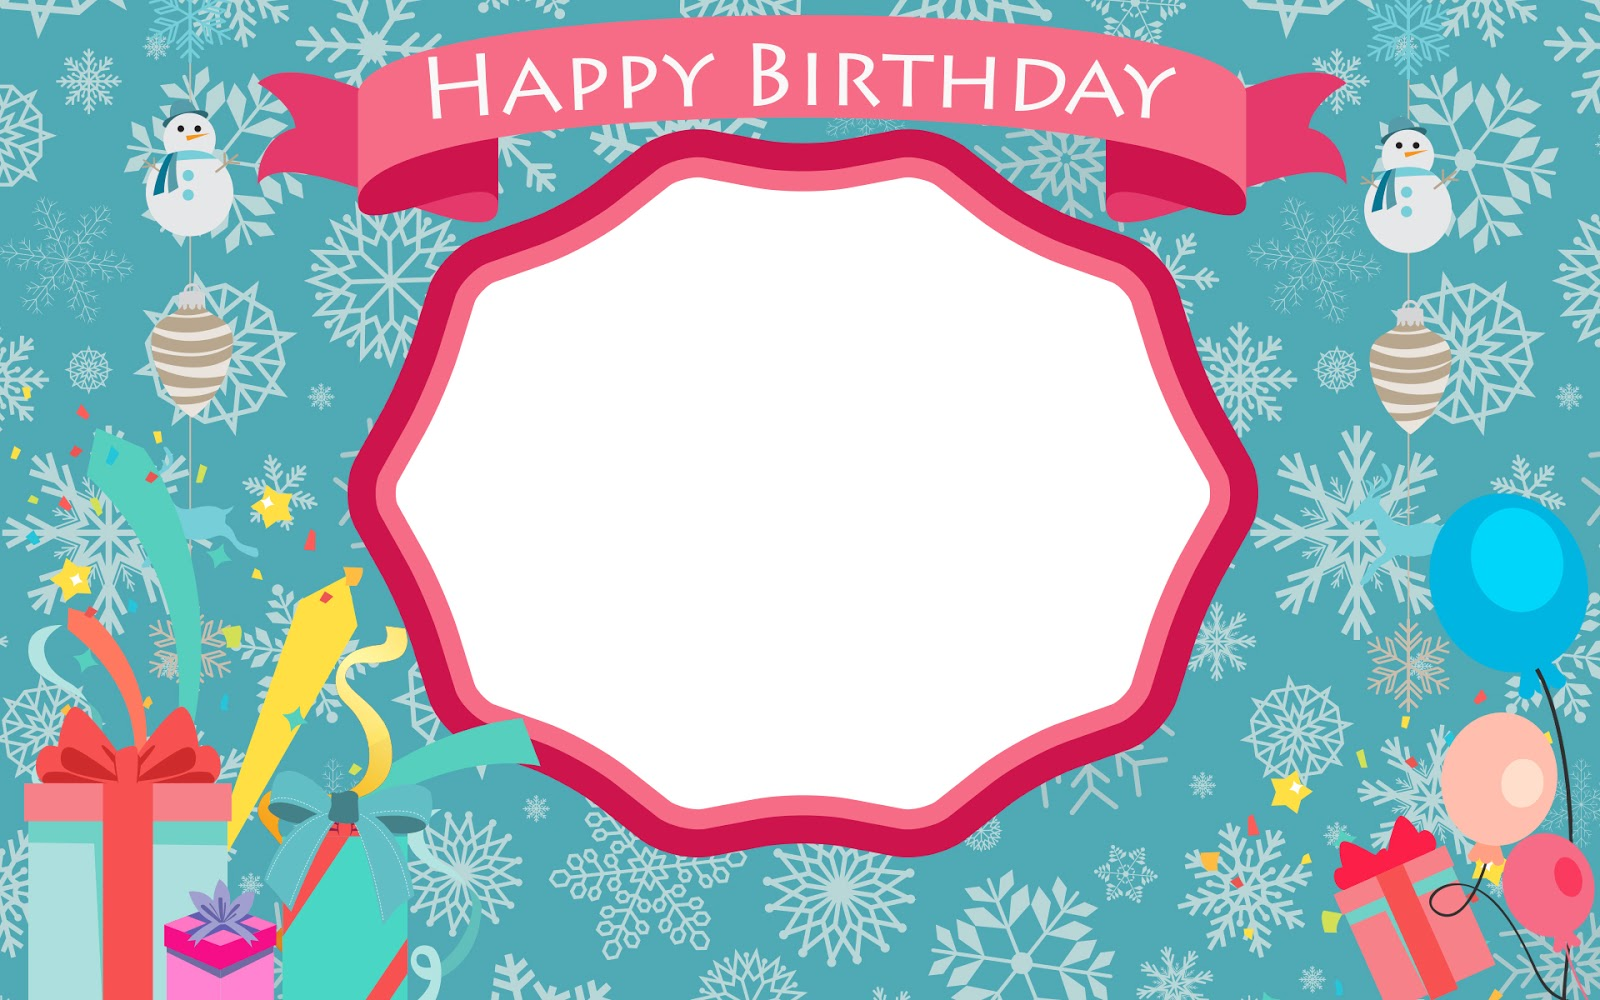 Free Birthday Background Theme Images